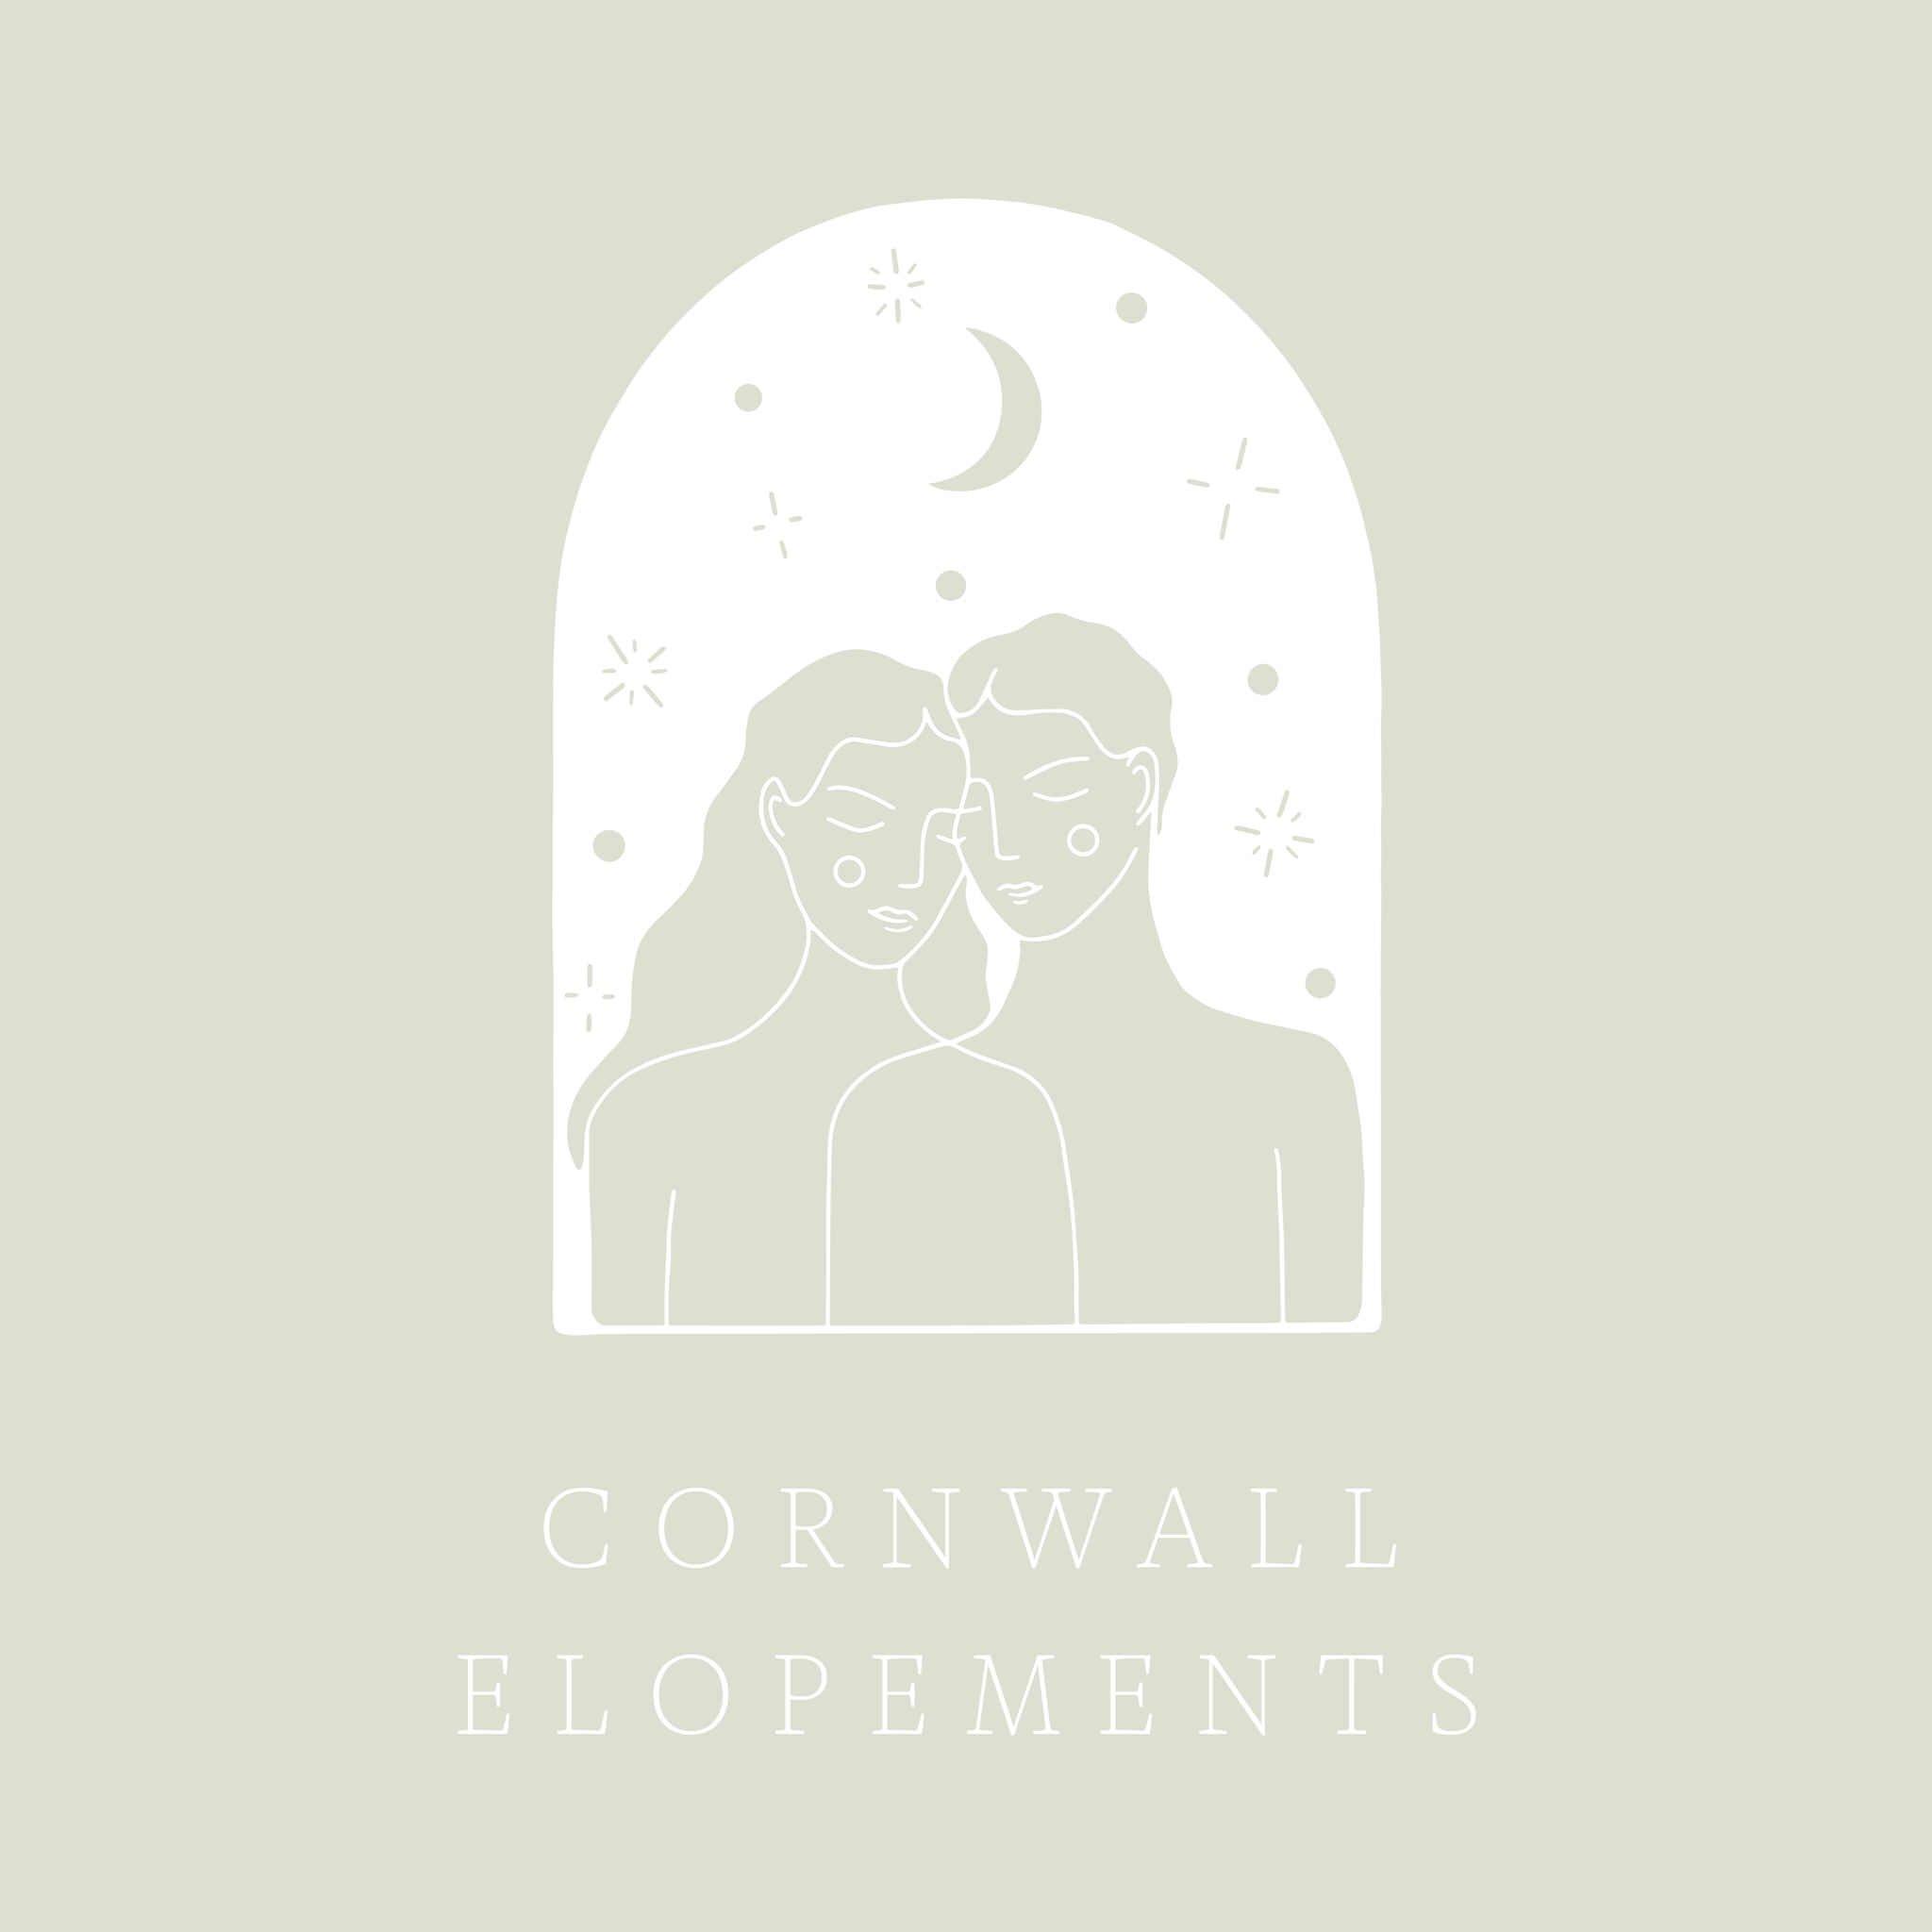 Cornwall Elopements